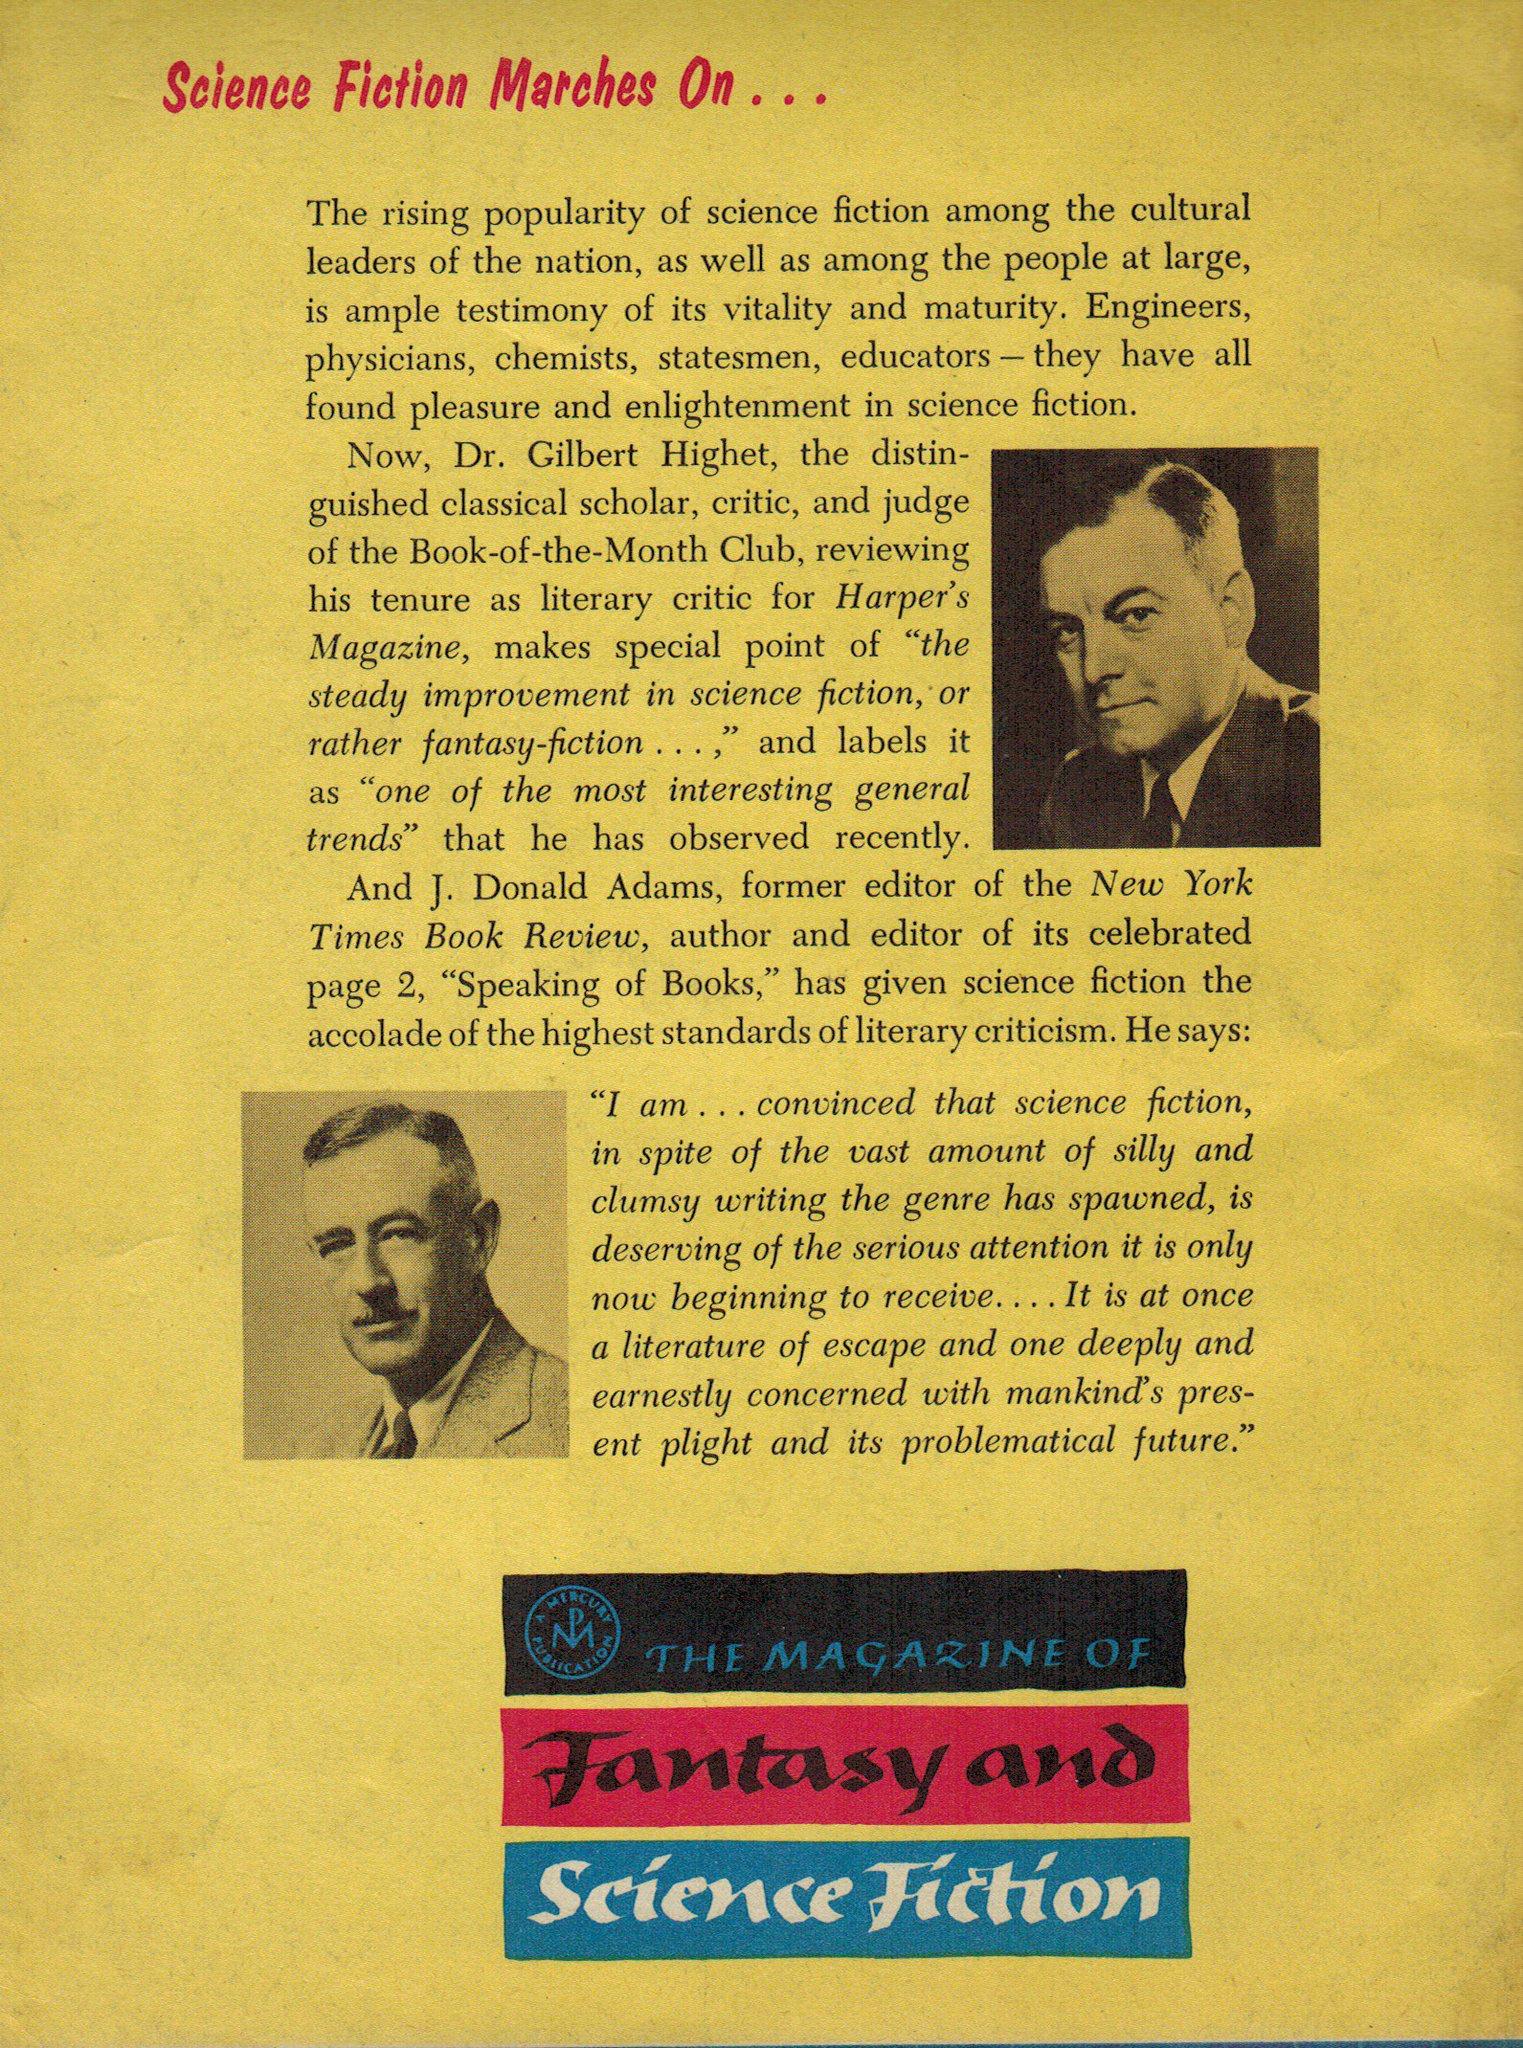 Fantasy & Science Fiction, October 1956 back cover